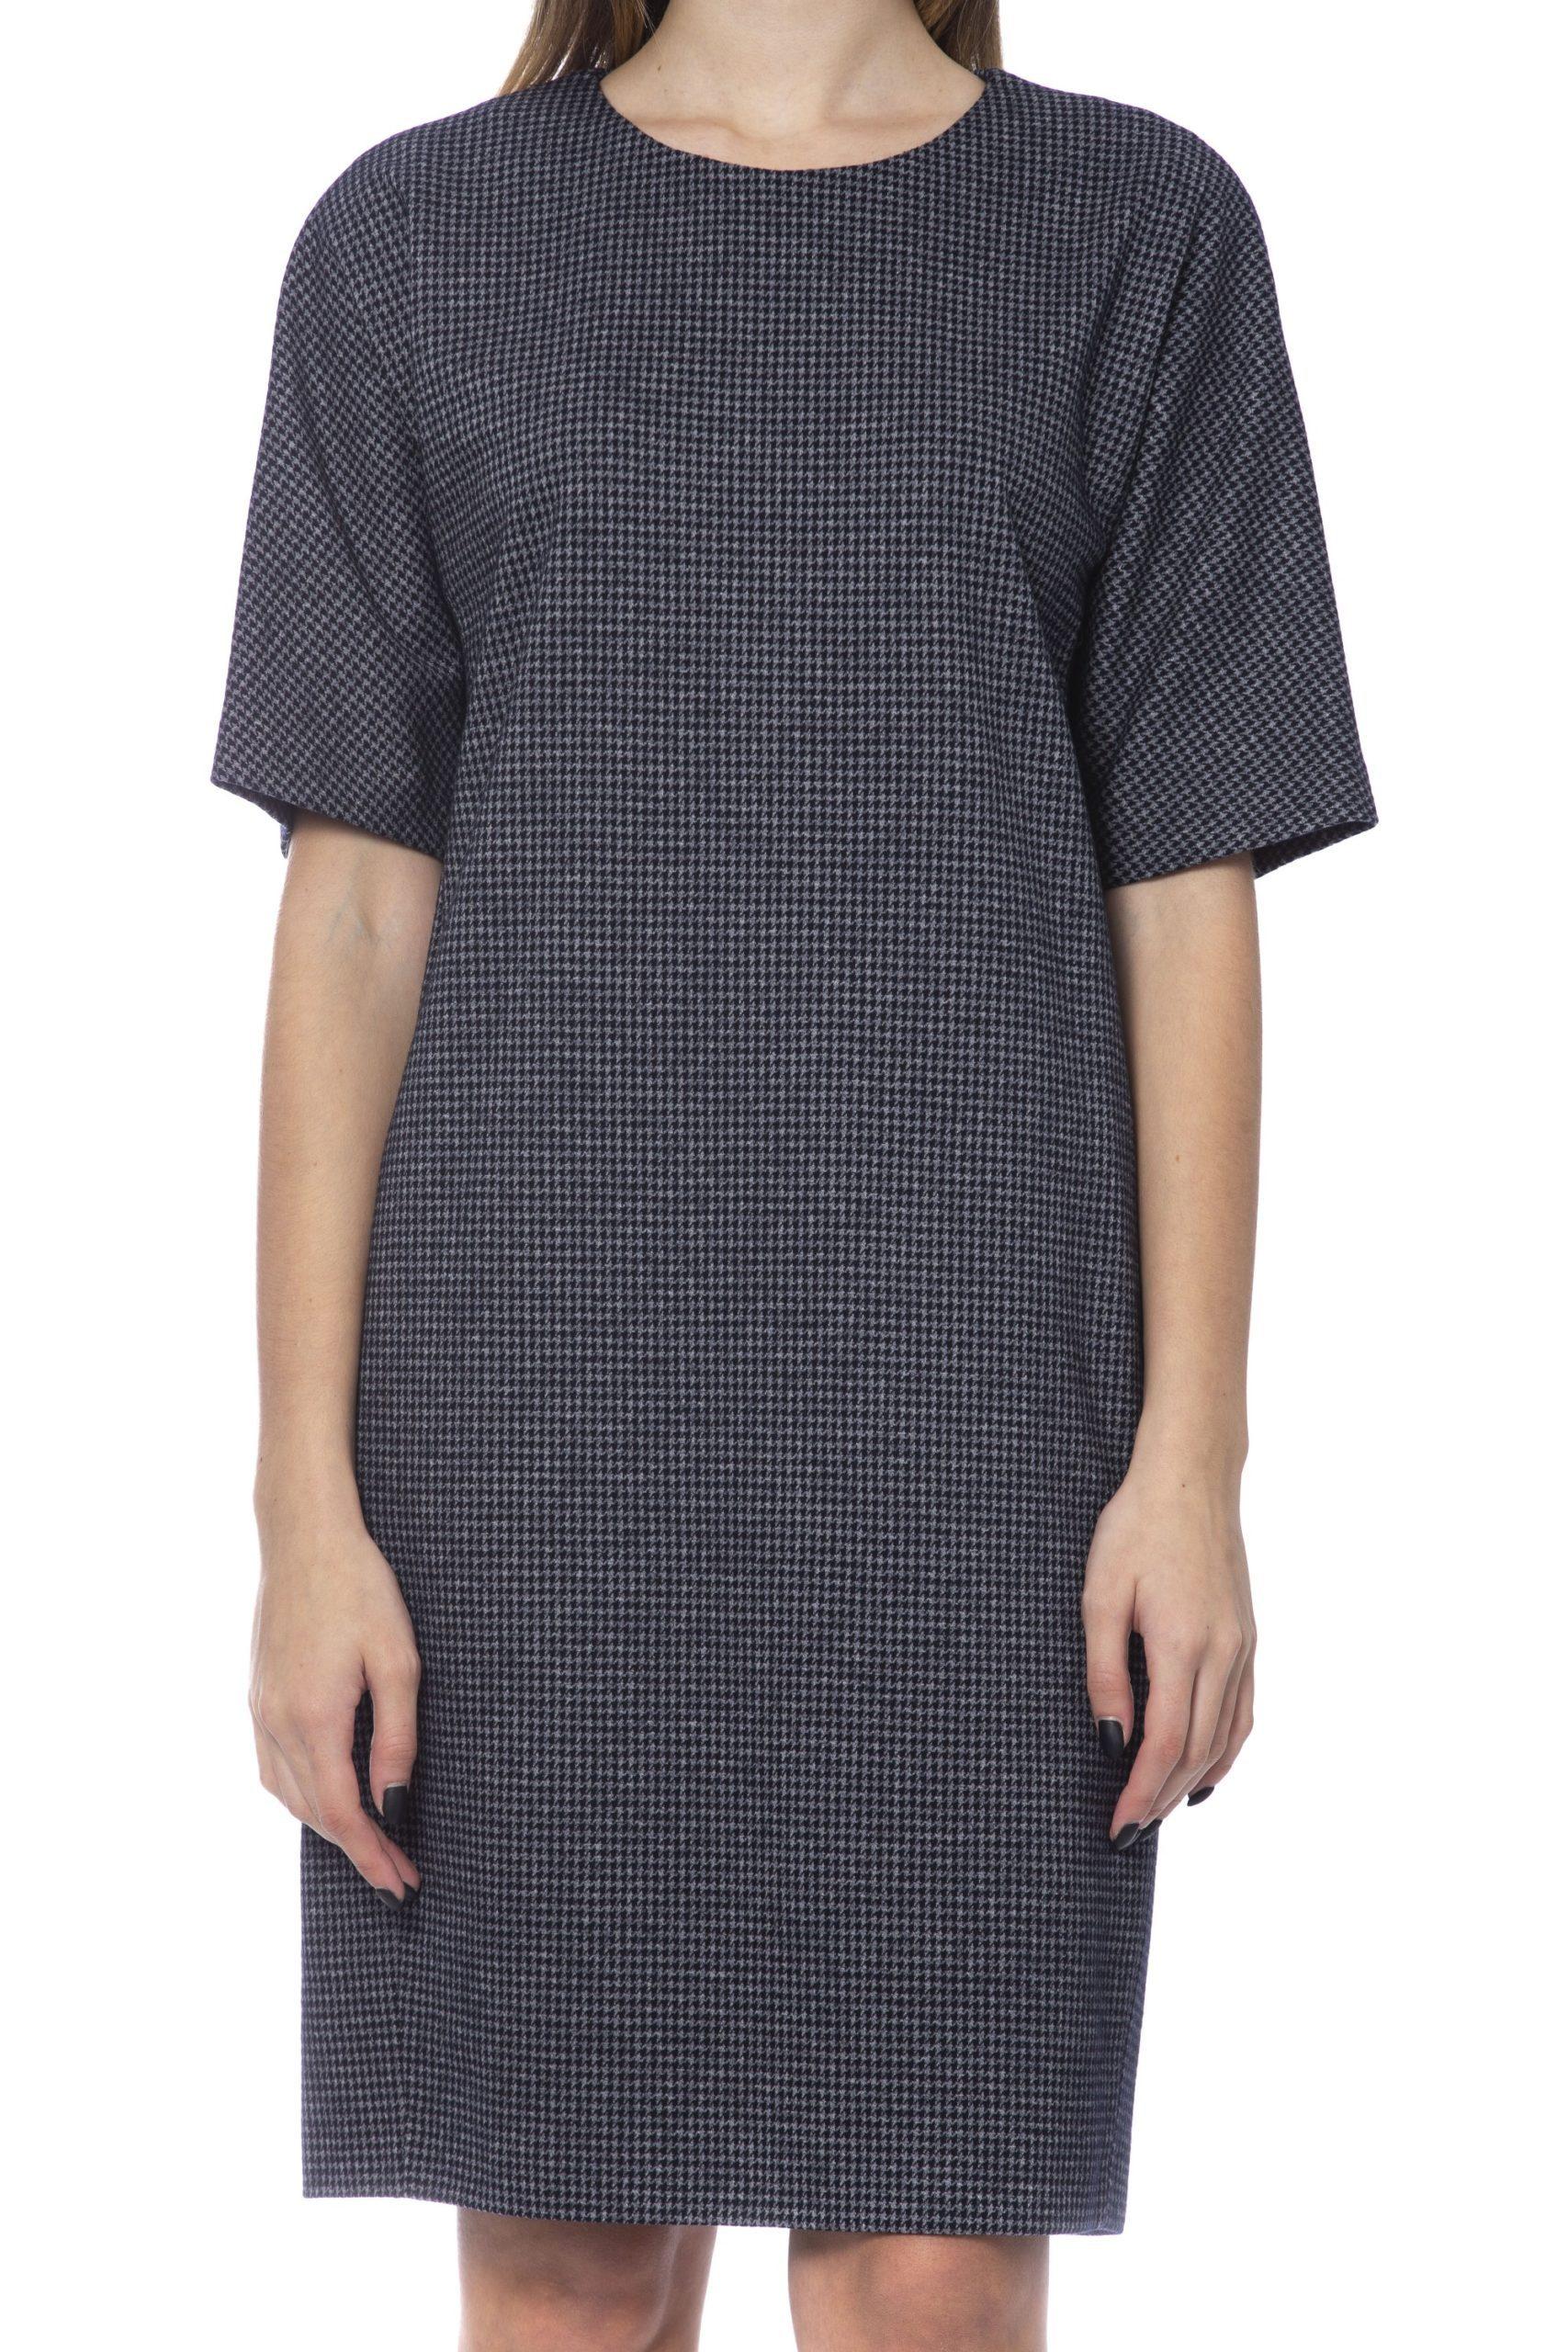 Peserico Women's Dress Blue PE992844 - IT42 | S